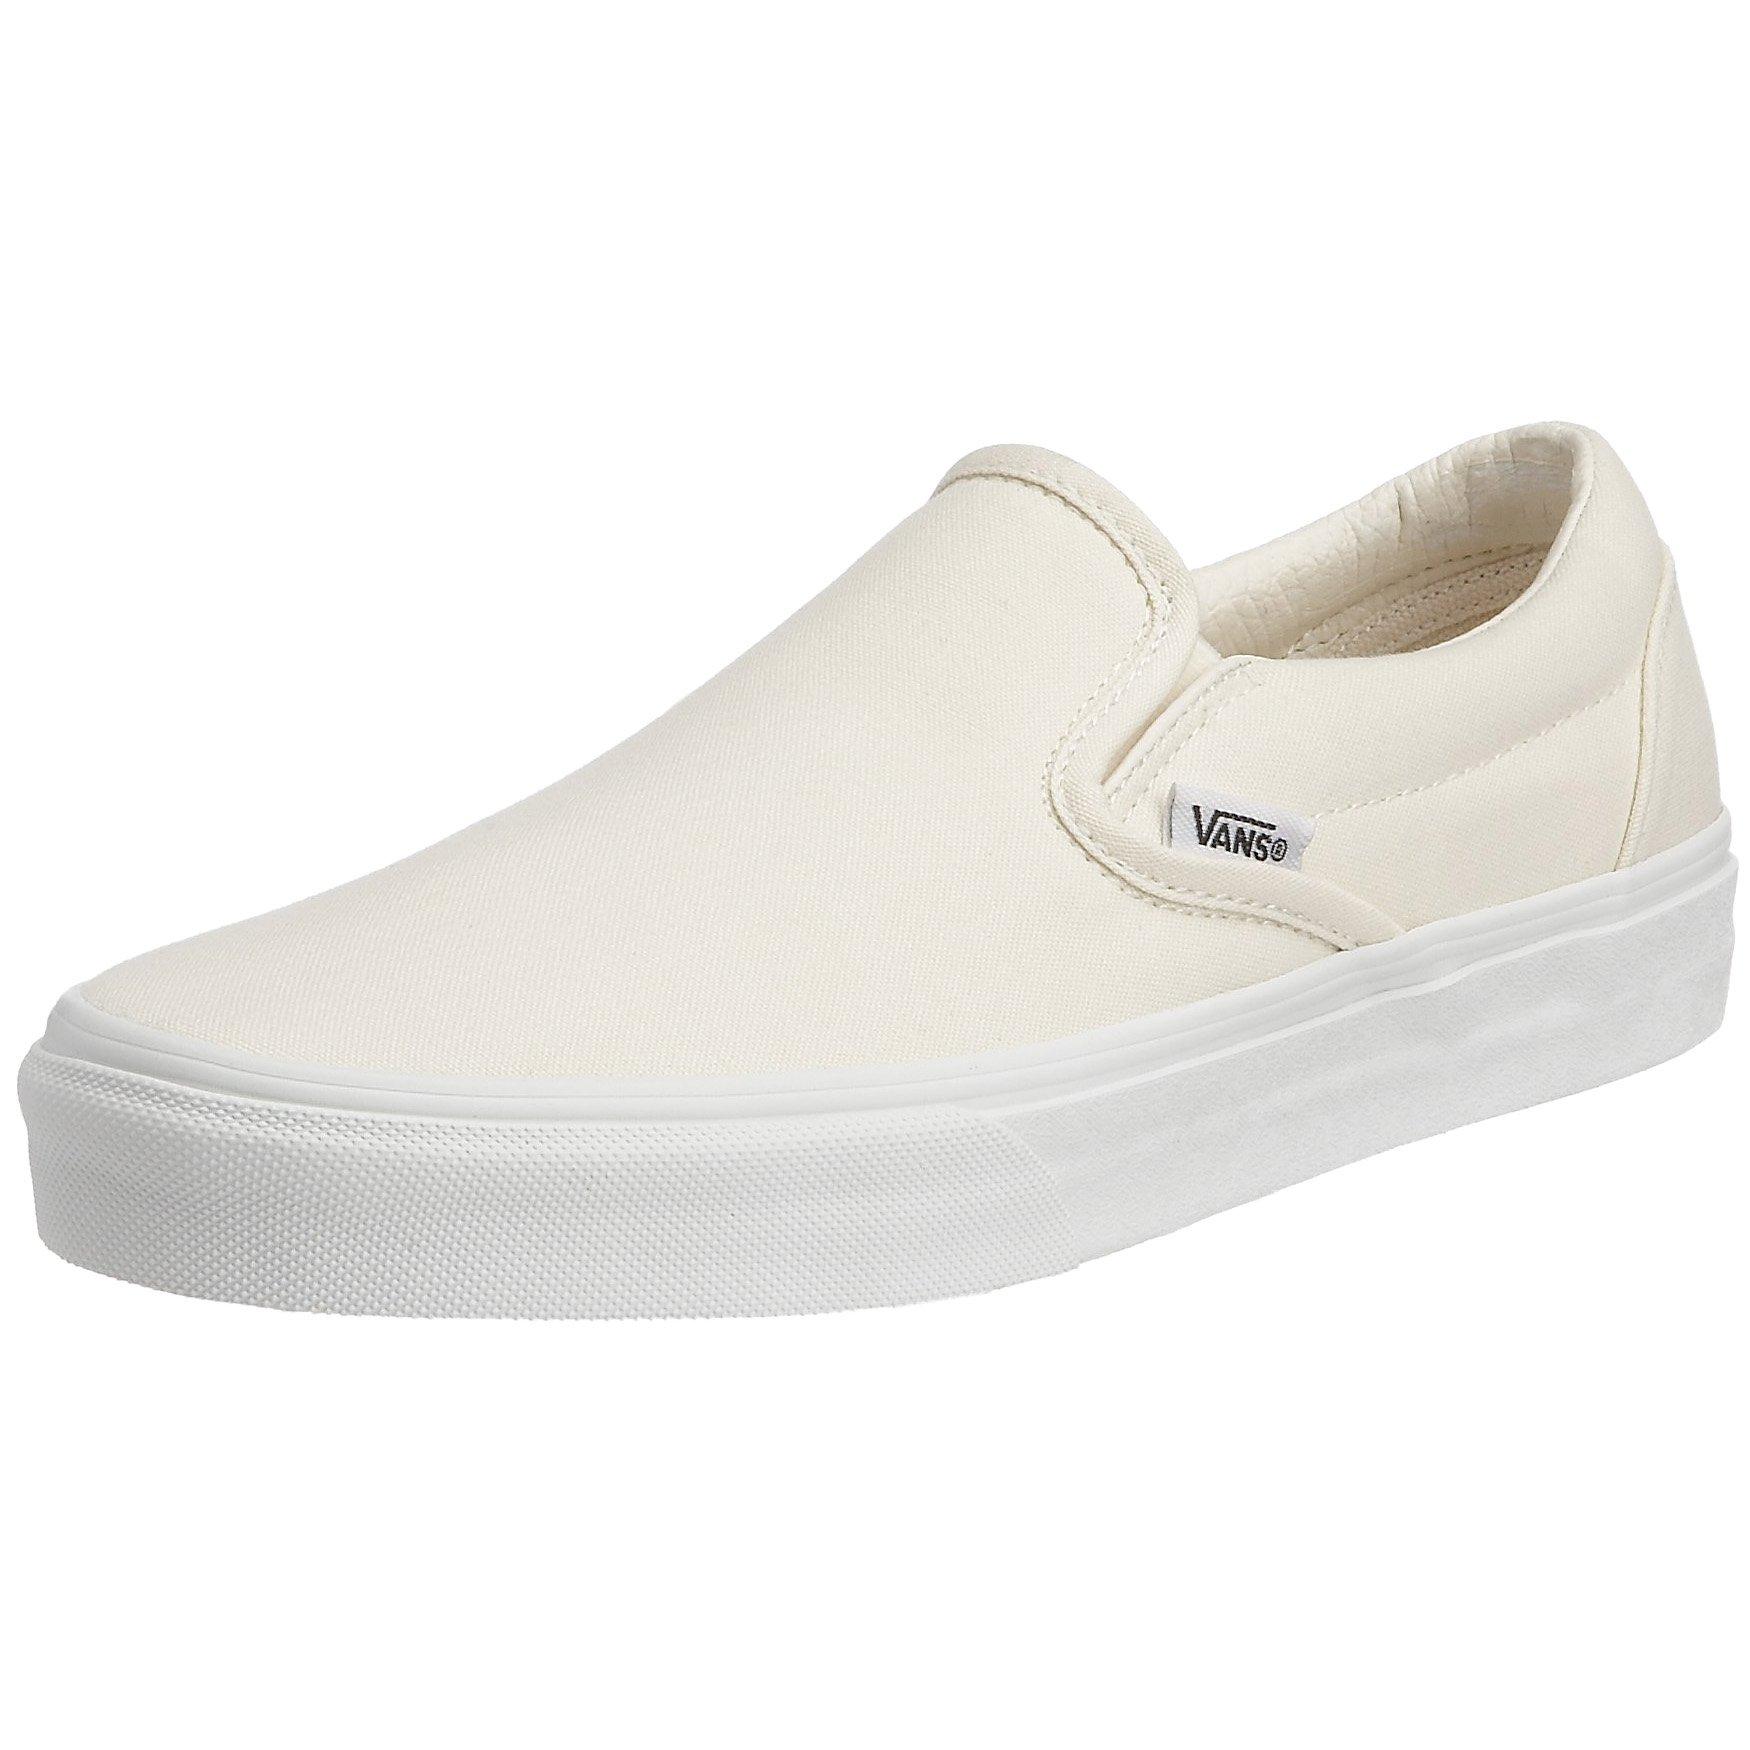 Vans Men's Slip-On(tm) Core Classics, (White Wht), Womens 8 by Vans (Image #1)